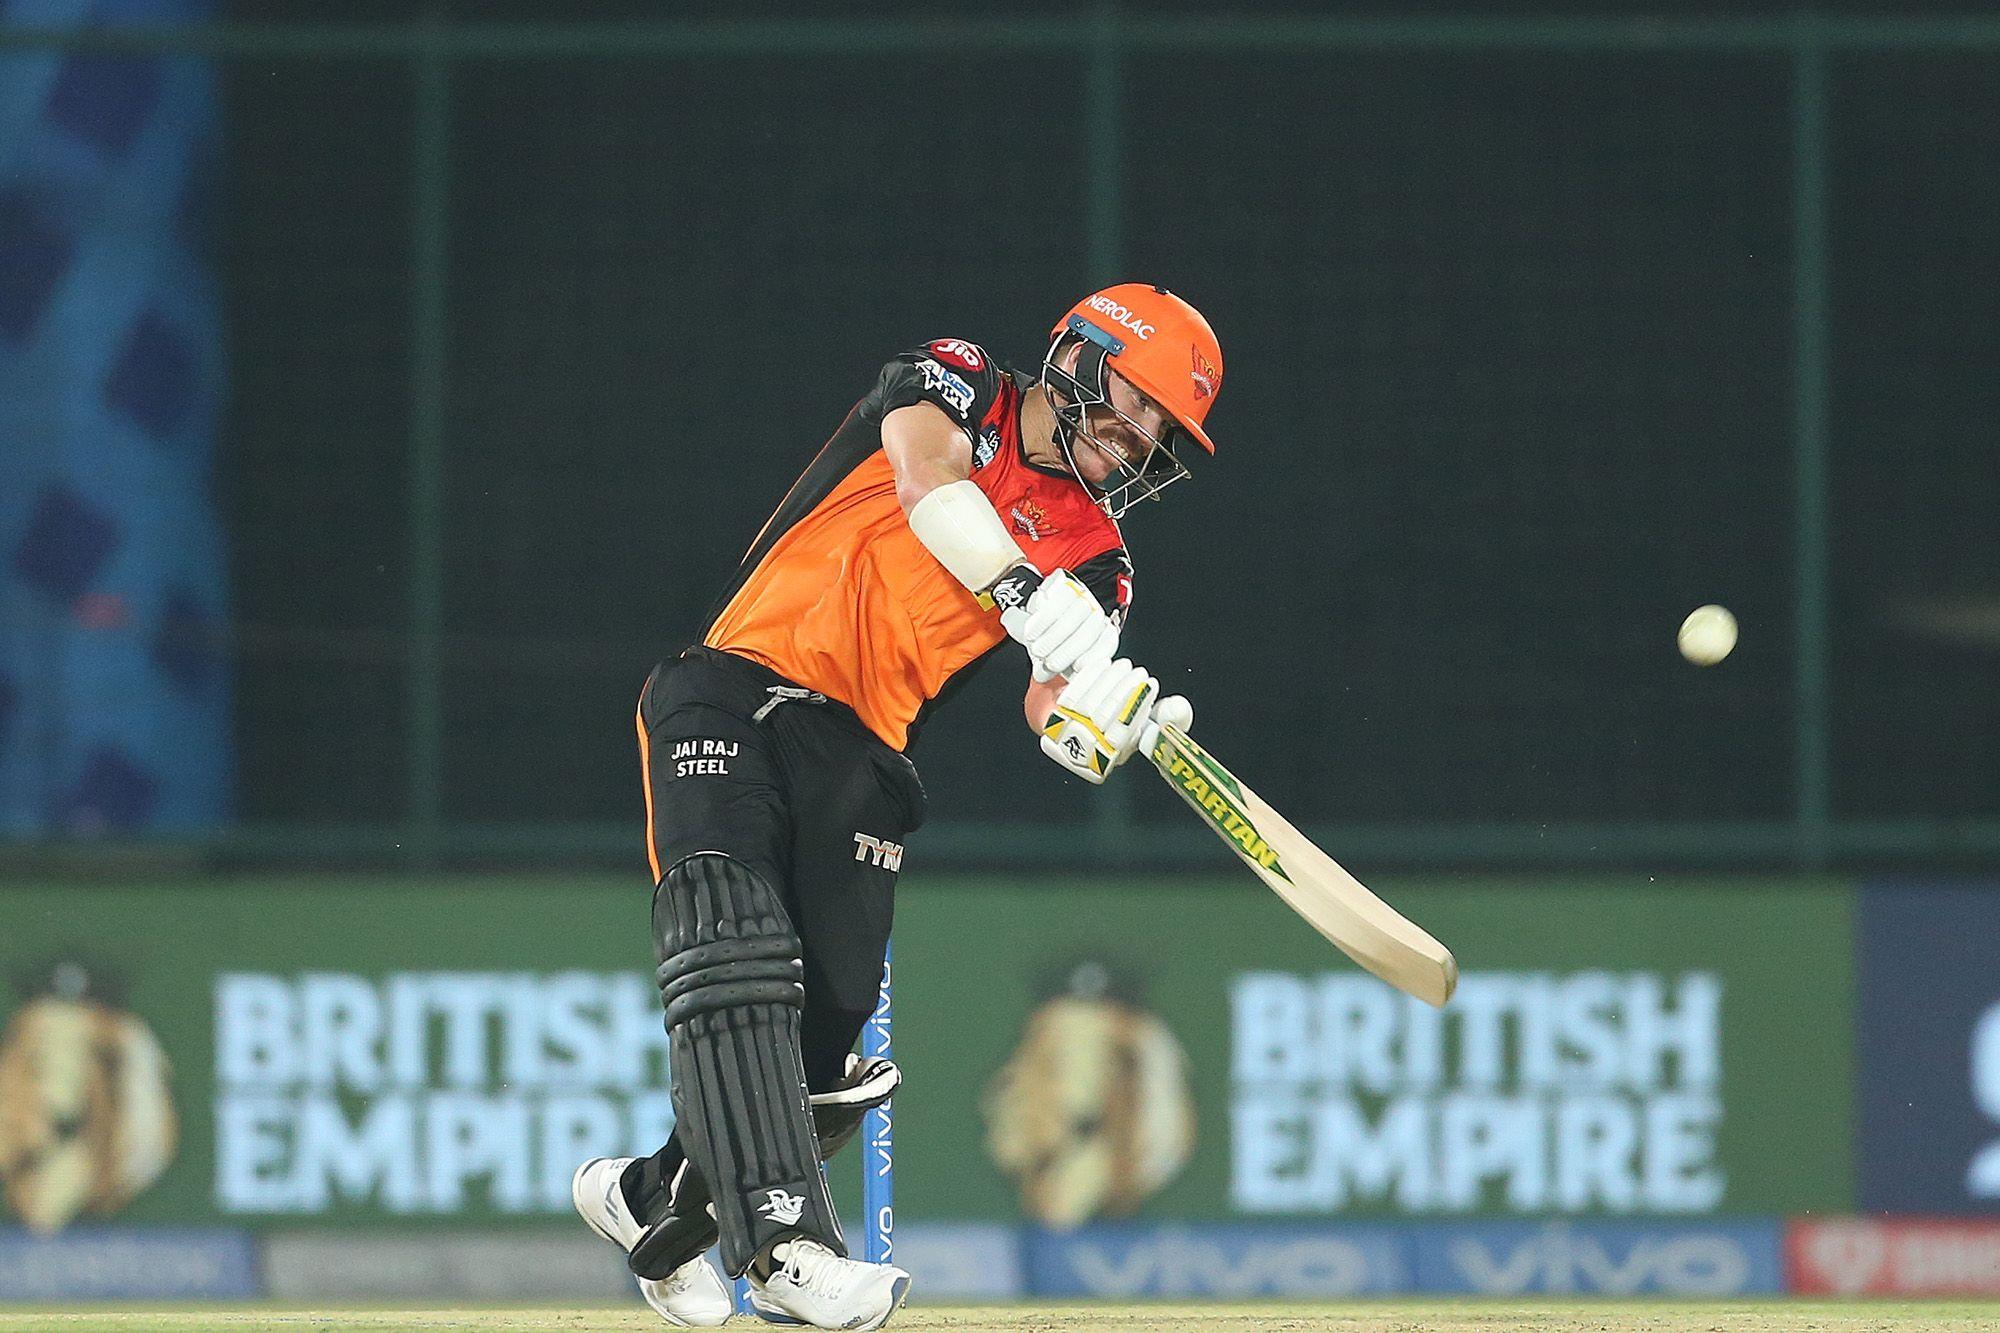 David Warner's slow innings hurt SRH against CSK | IPL/BCCI